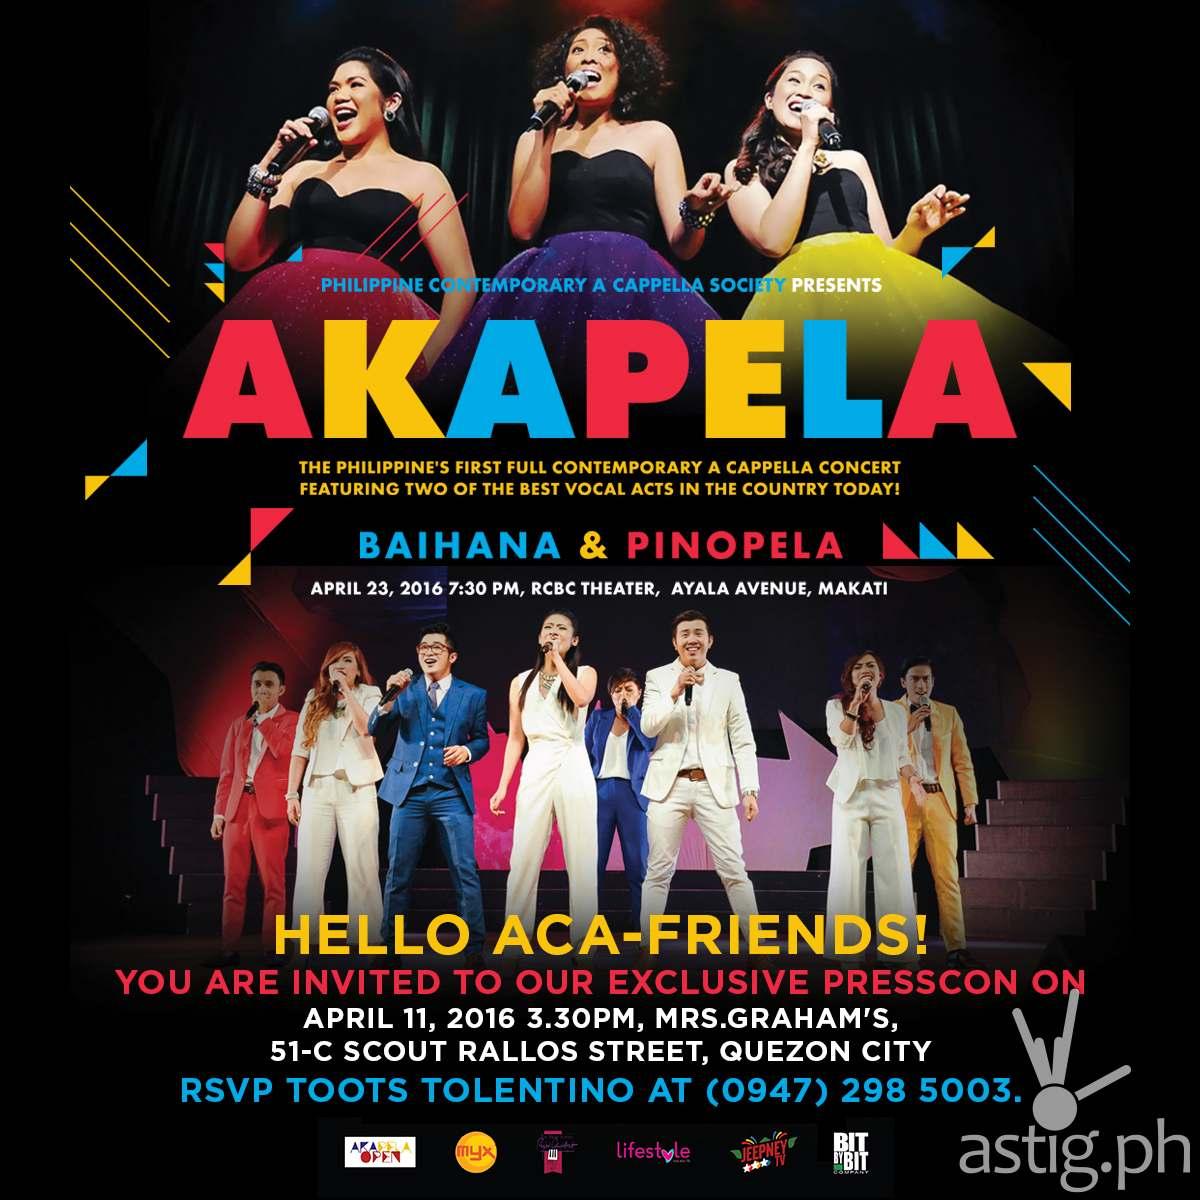 AKAPELA - PRESS LAUNCH INVITATION - APRIL 11